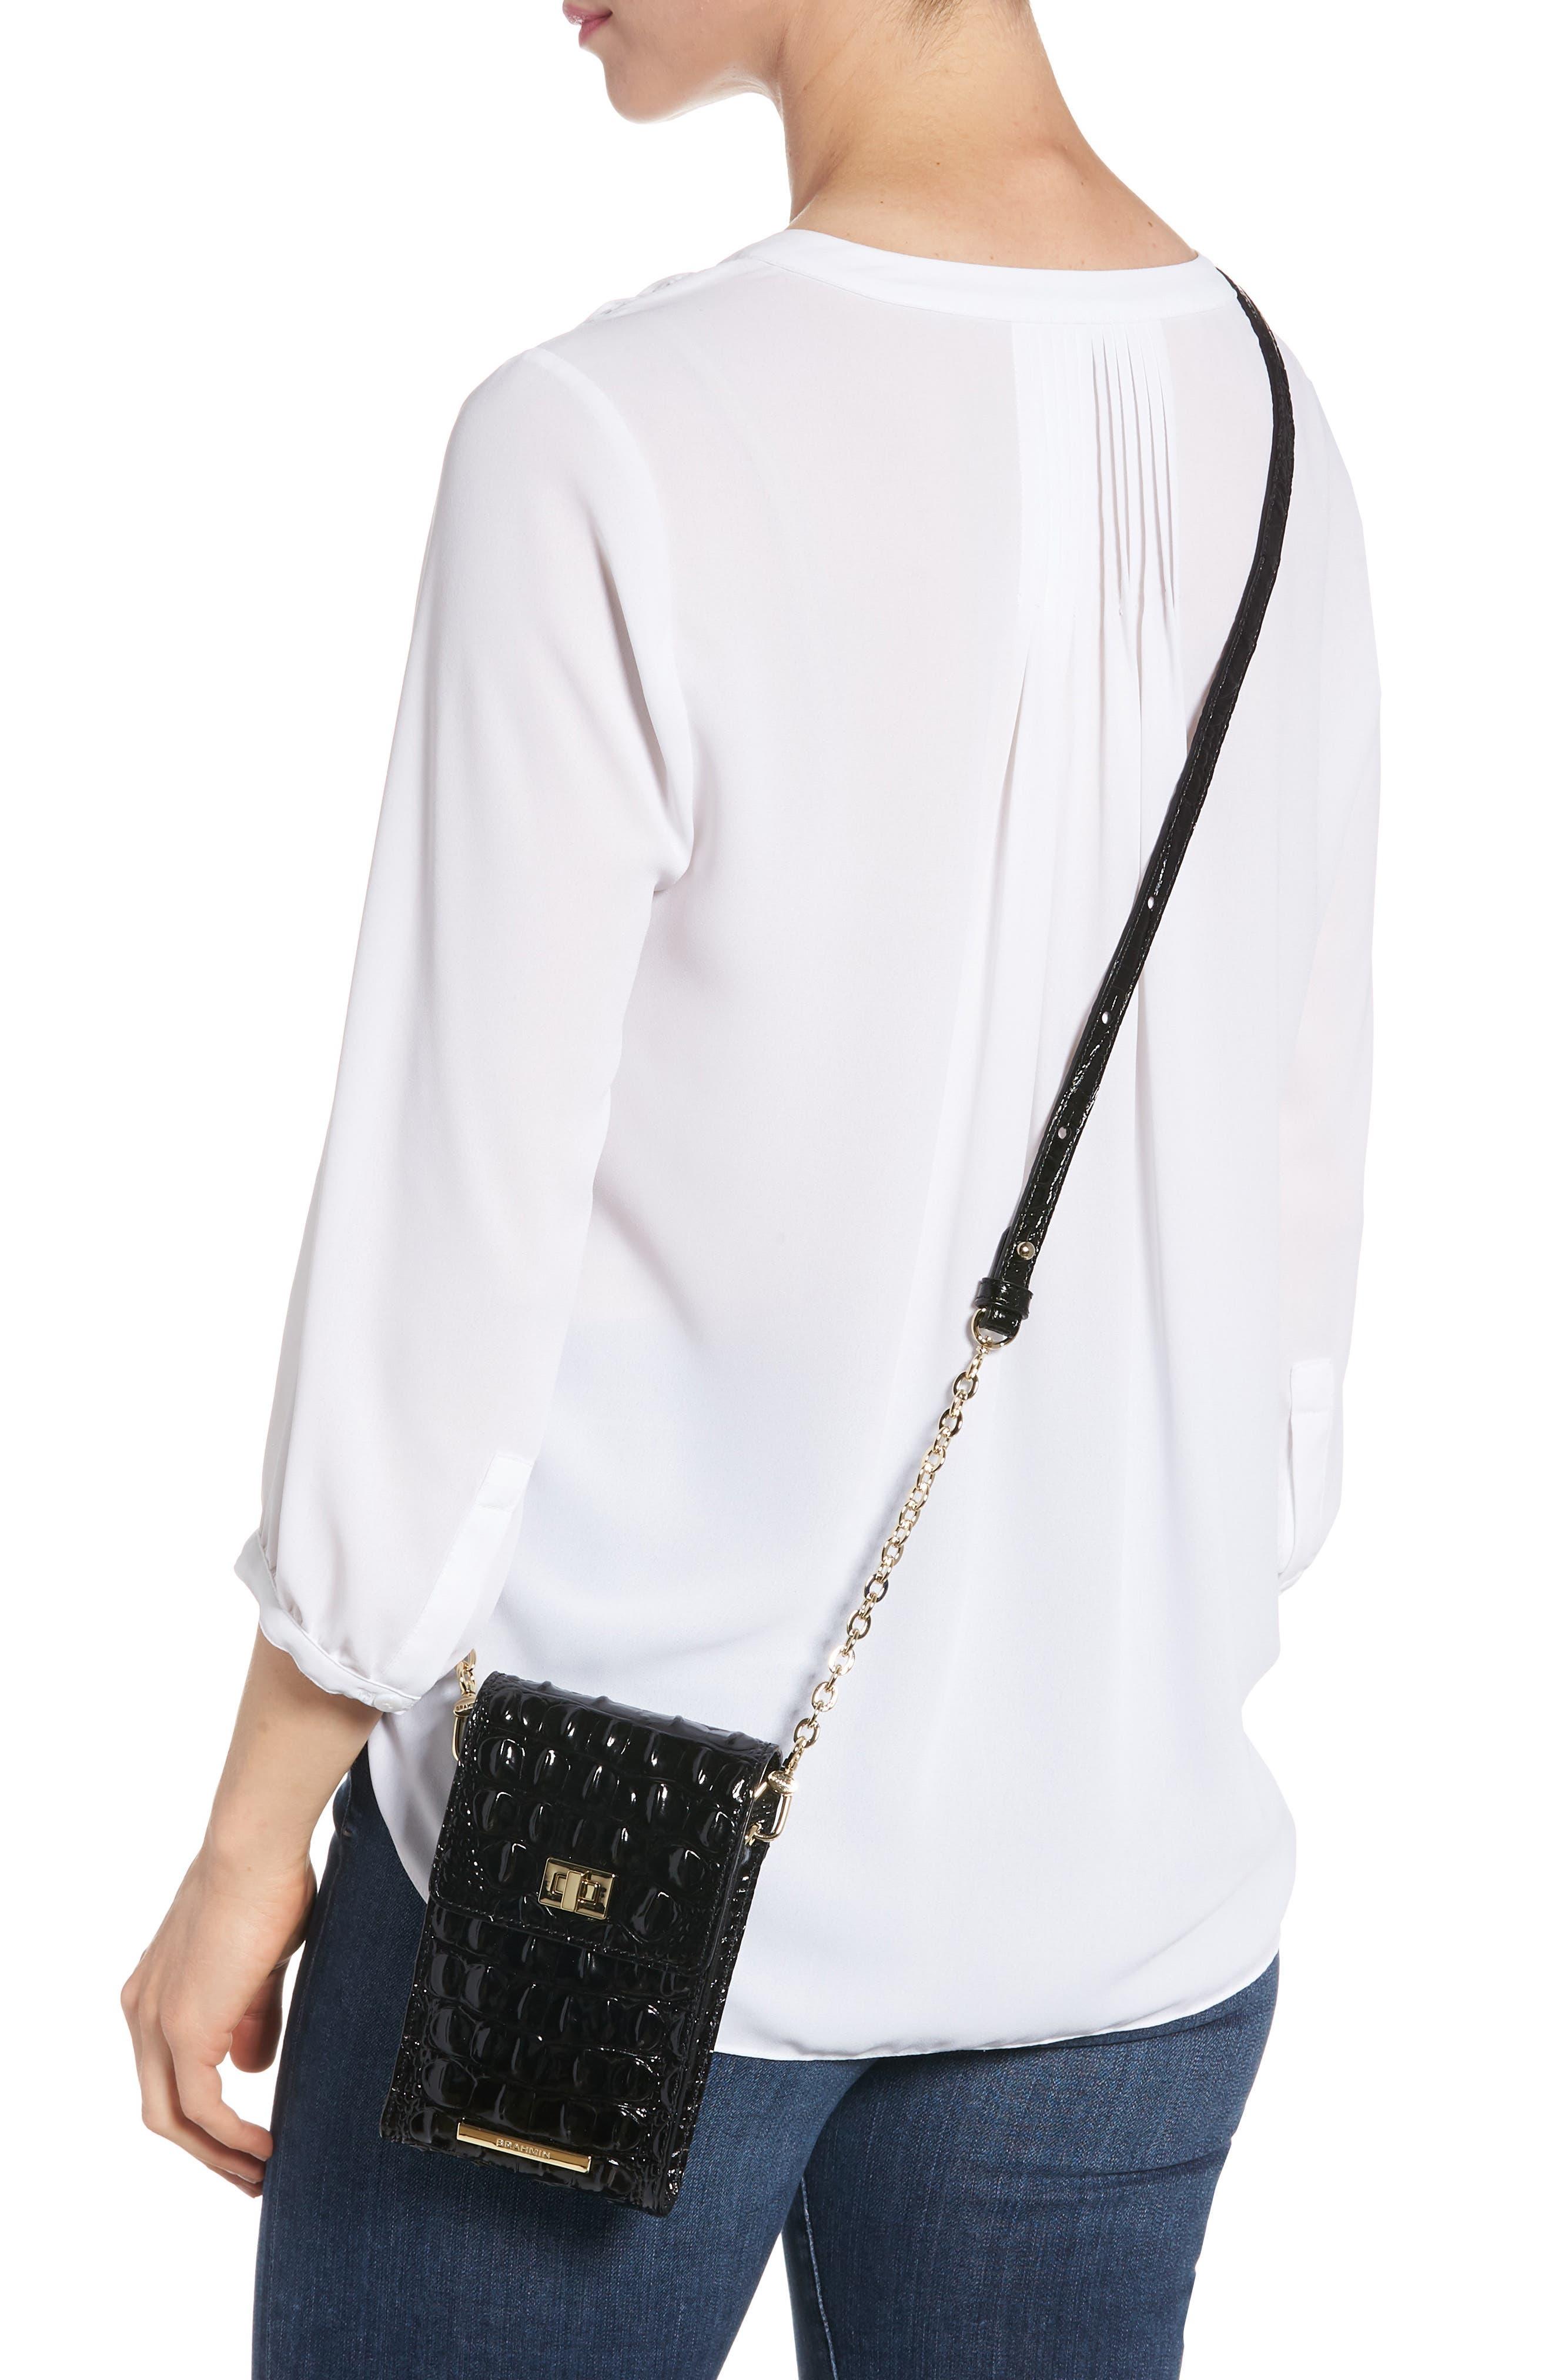 Madison Leather Smartphone Crossbody Bag,                             Alternate thumbnail 2, color,                             BLACK